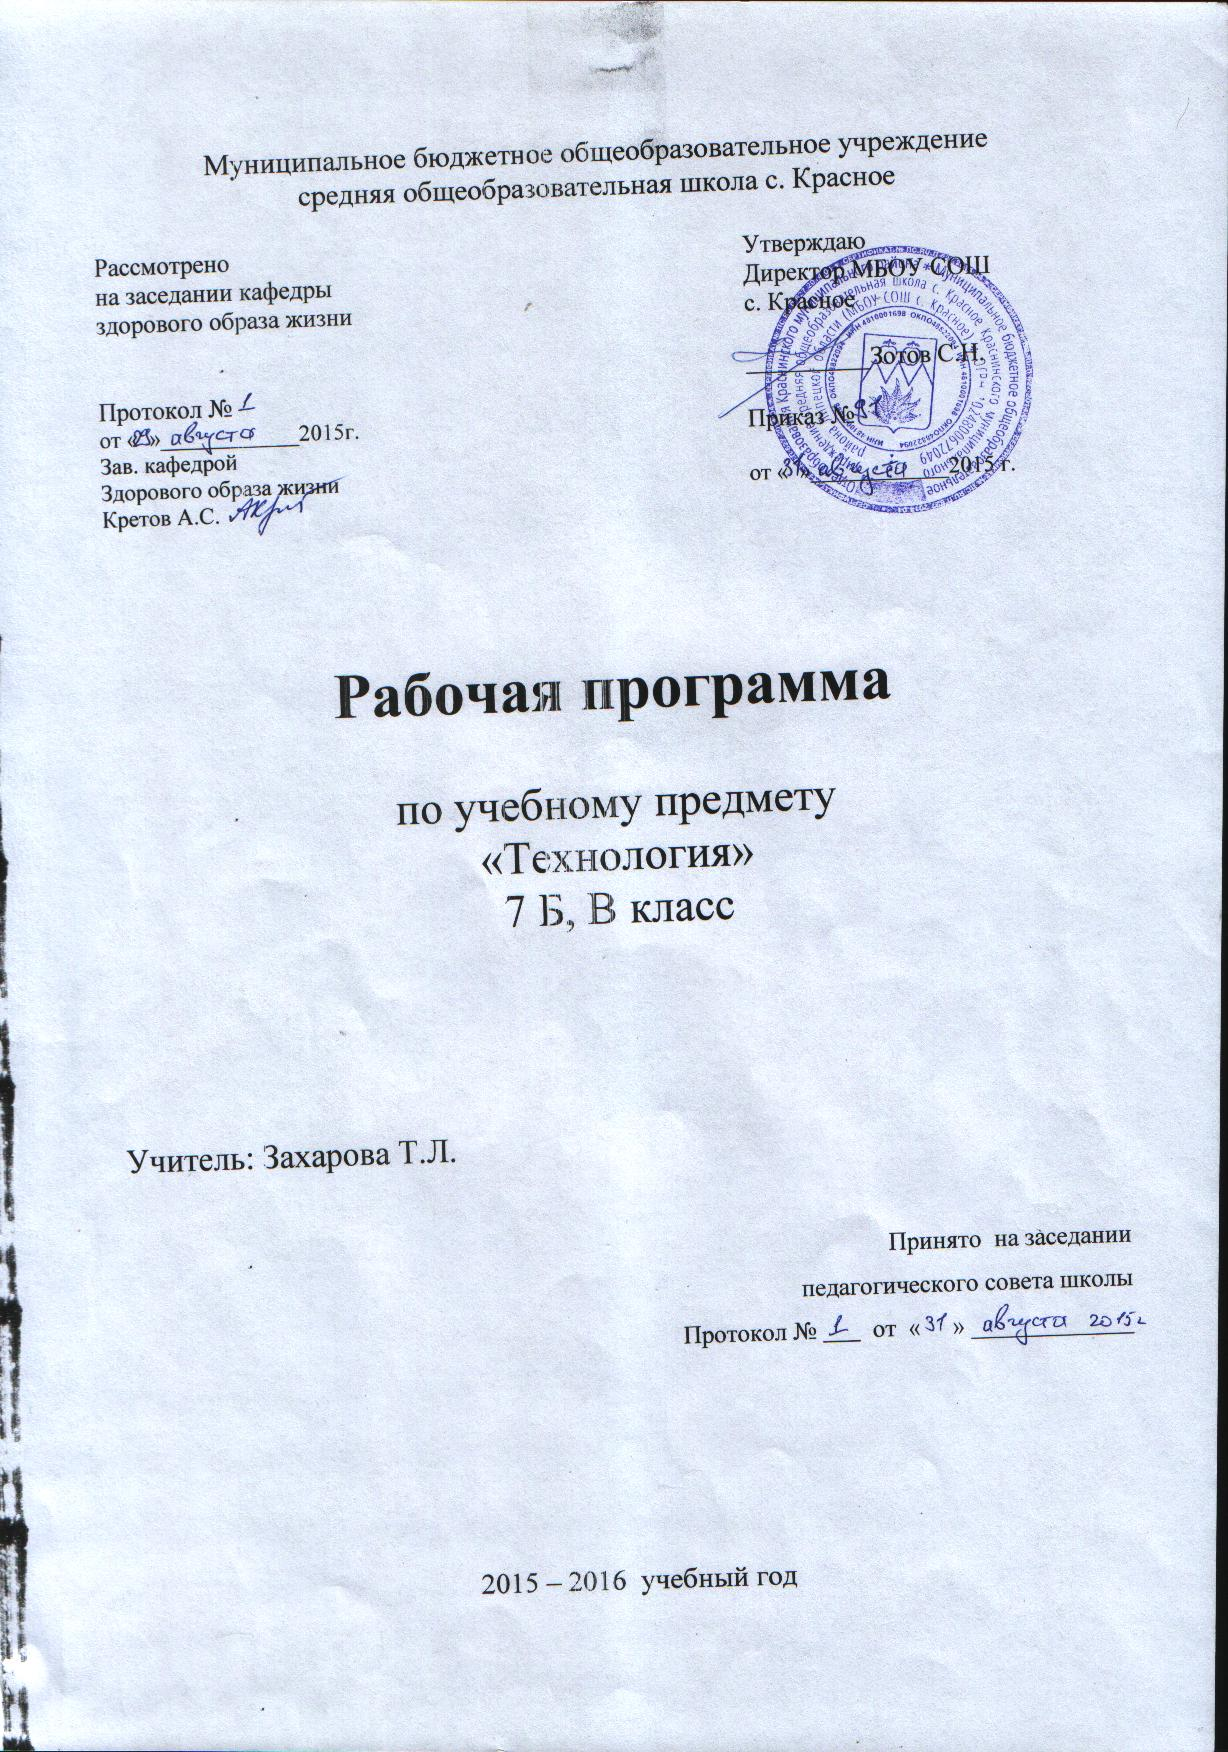 C:\Documents and Settings\Захарова\Рабочий стол\тит.листы\Программа 003.jpg